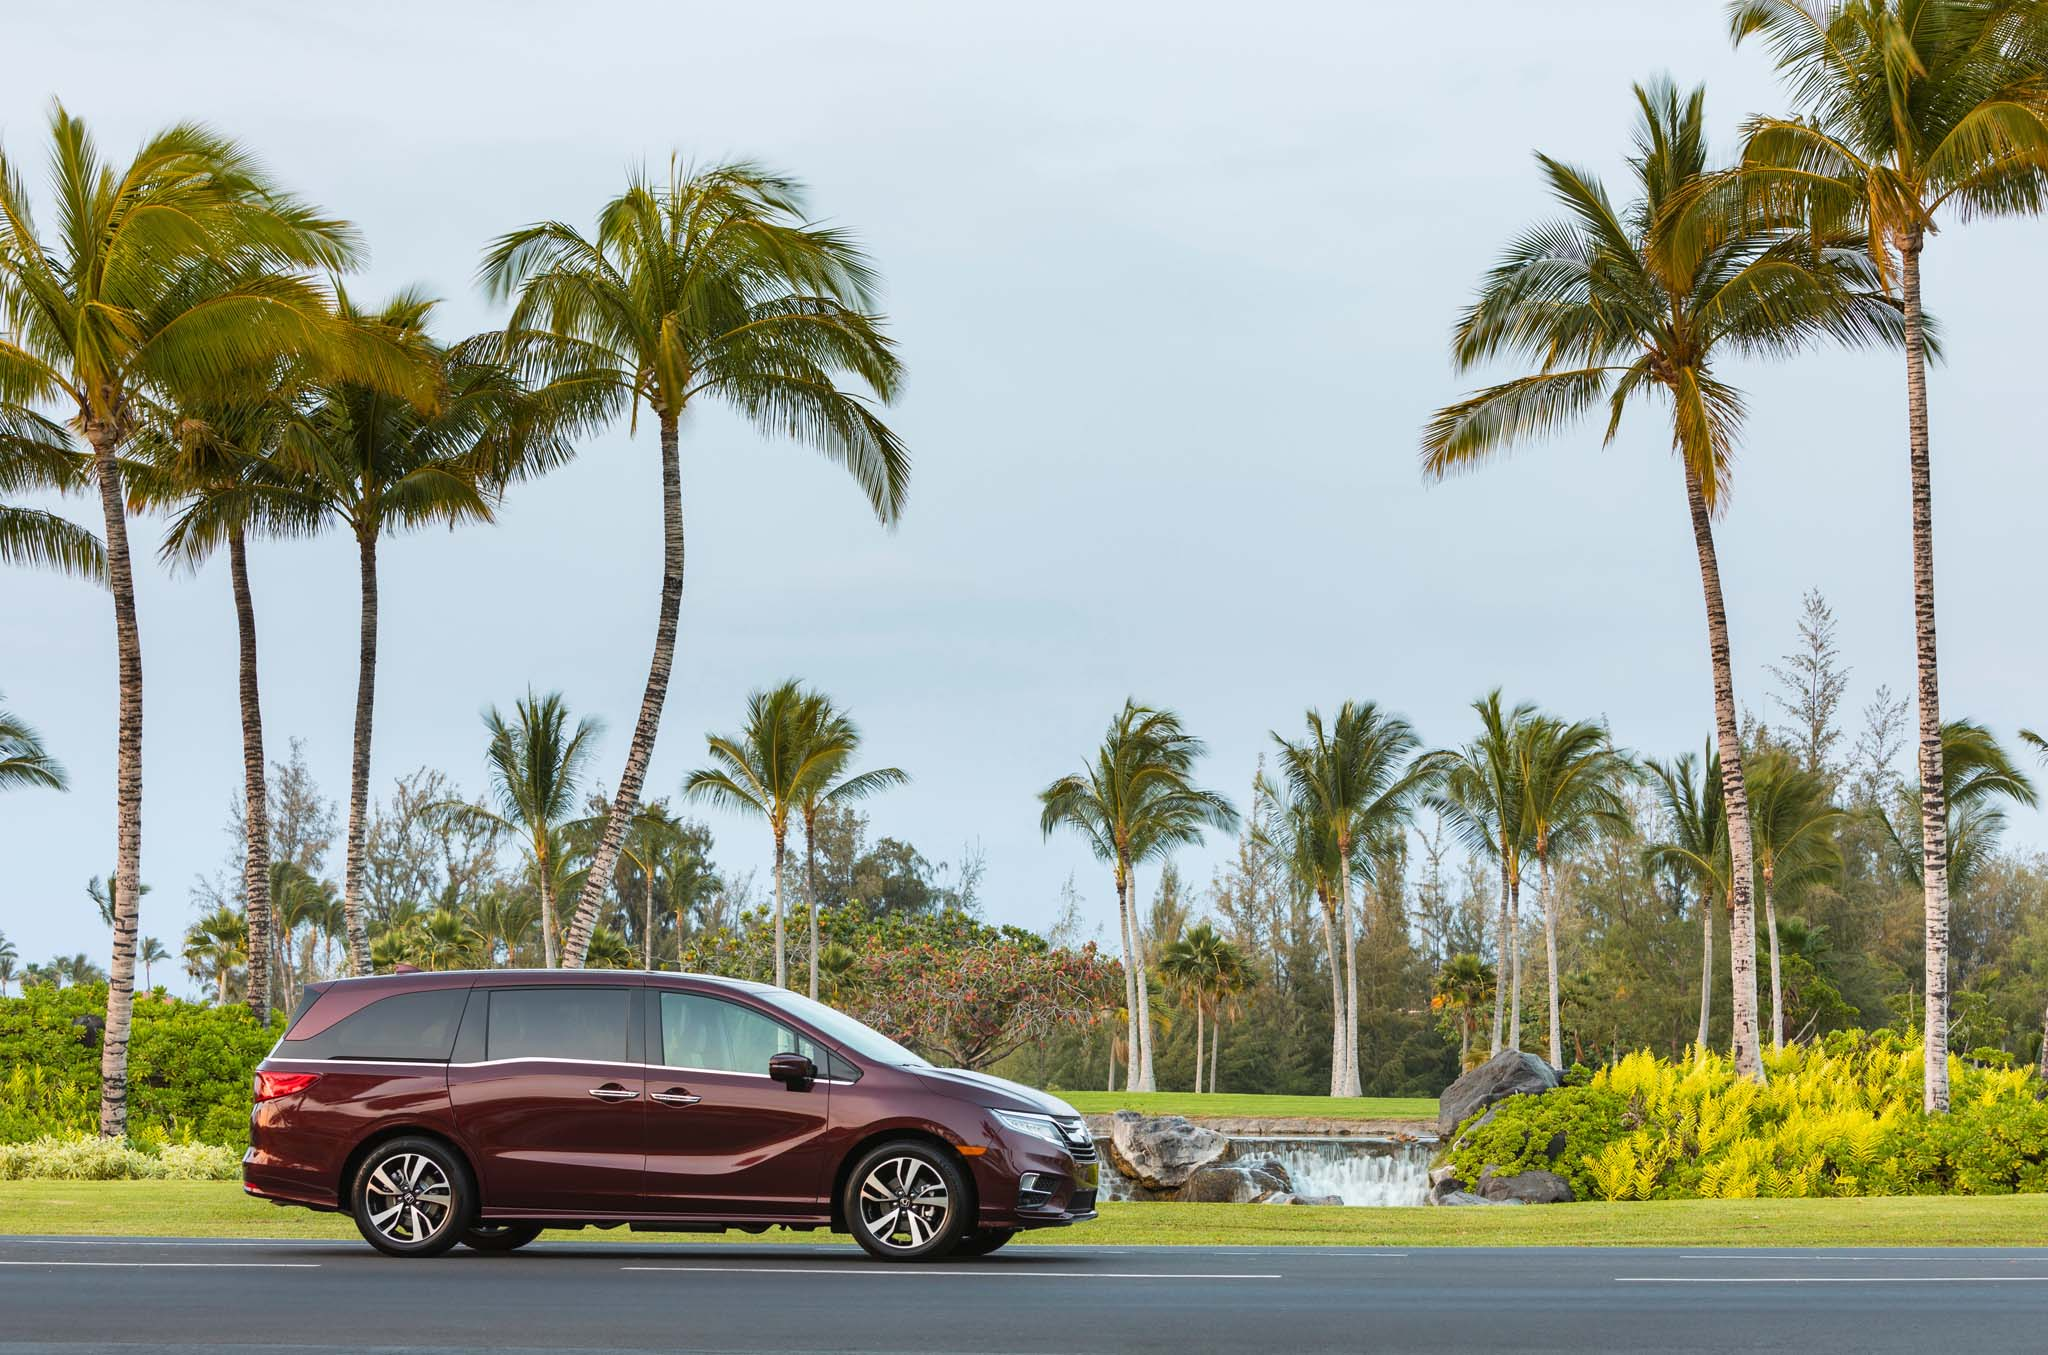 2018 Honda Odyssey Side Profile 05